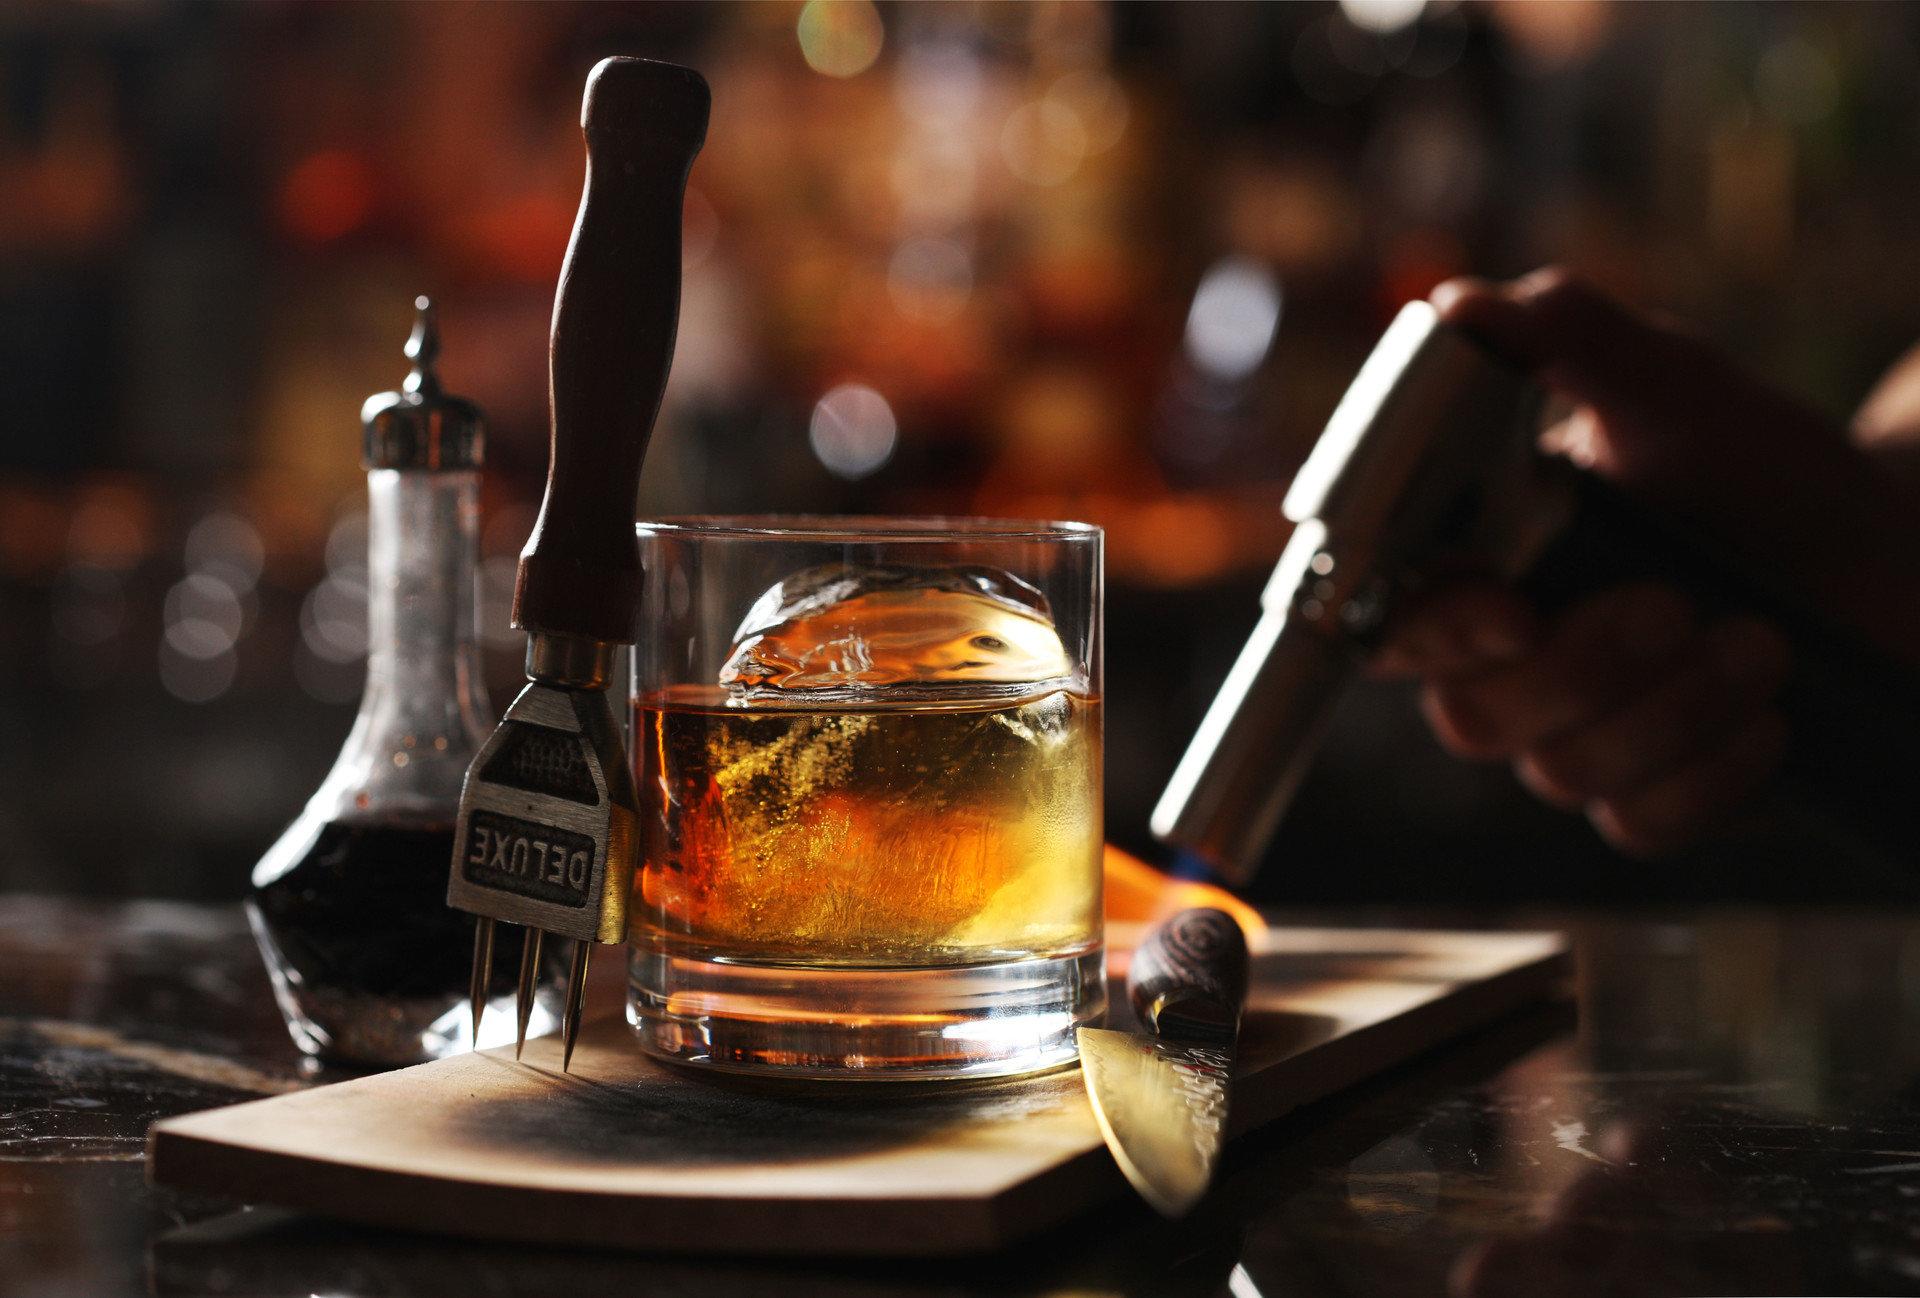 bourbon cocktails craft cocktail Drink drinks Food + Drink gourmet Offbeat scotch whiskey table indoor alcoholic beverage distilled beverage alcohol whisky cocktail liqueur Bar glass